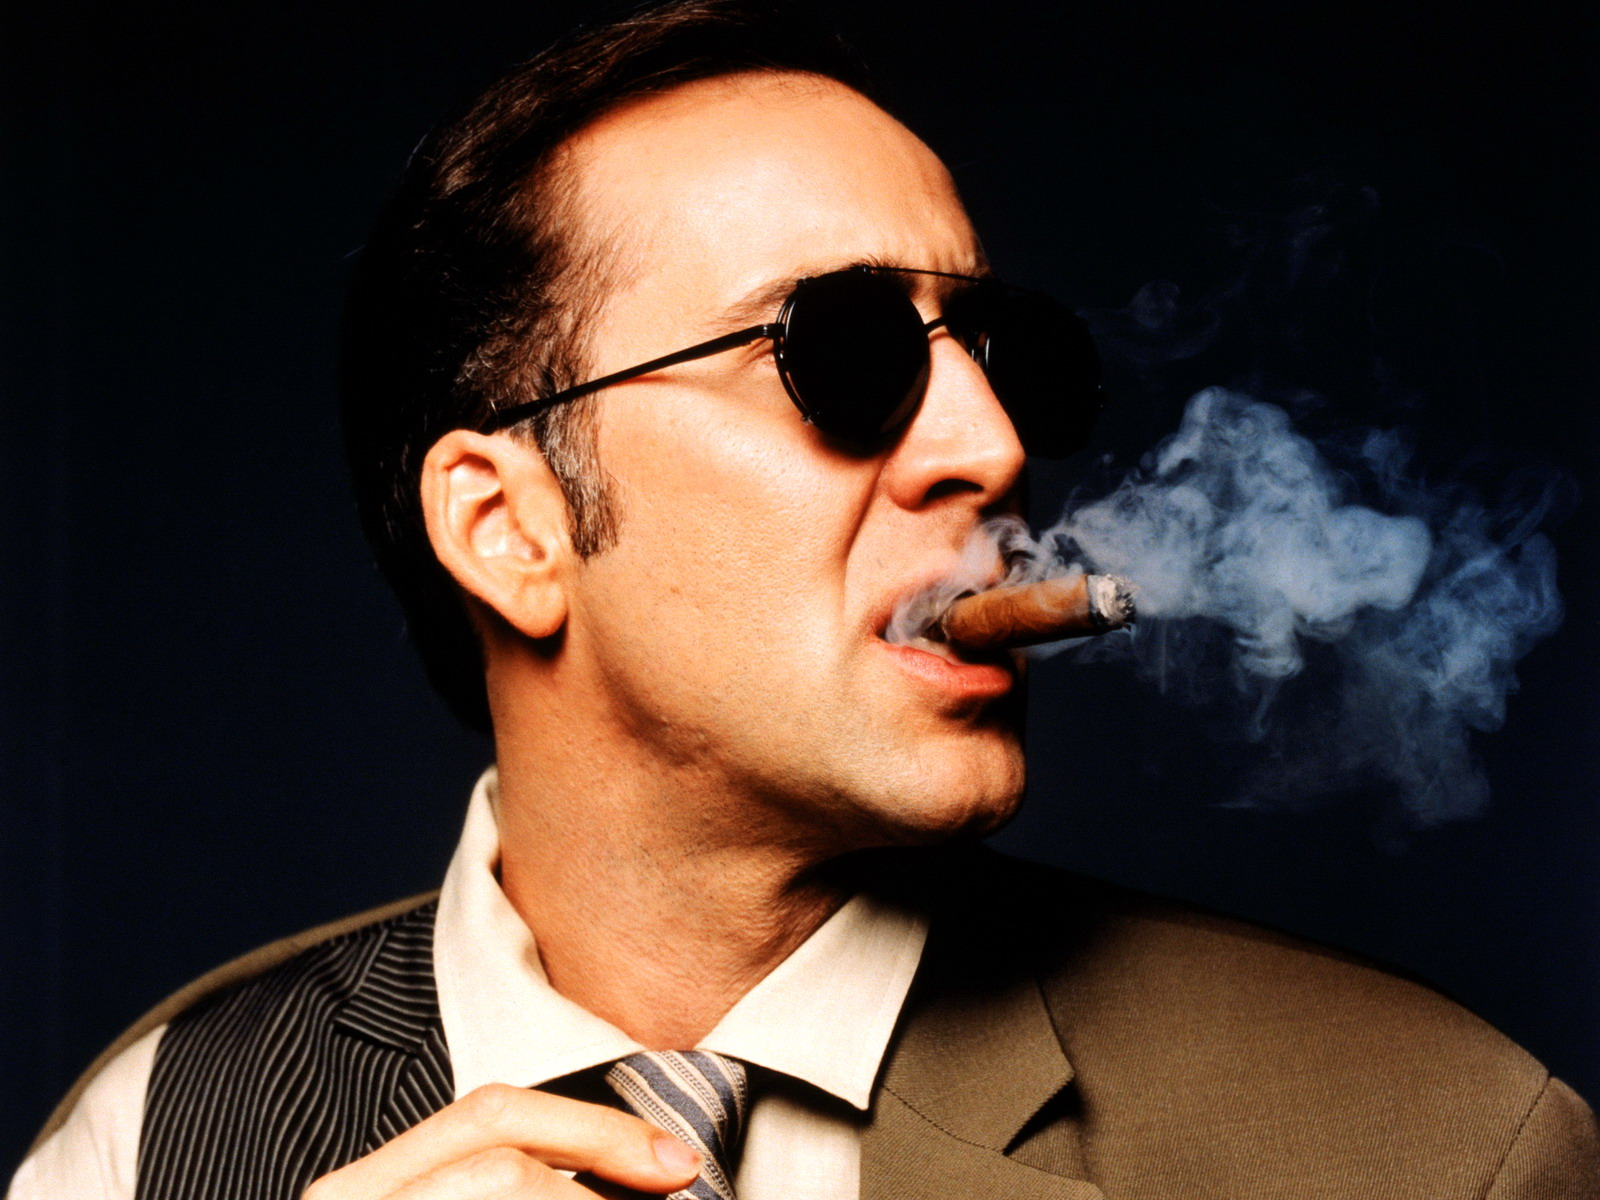 Nicolas Cage engaging Full HD wallpaper Free - Download Nicolas